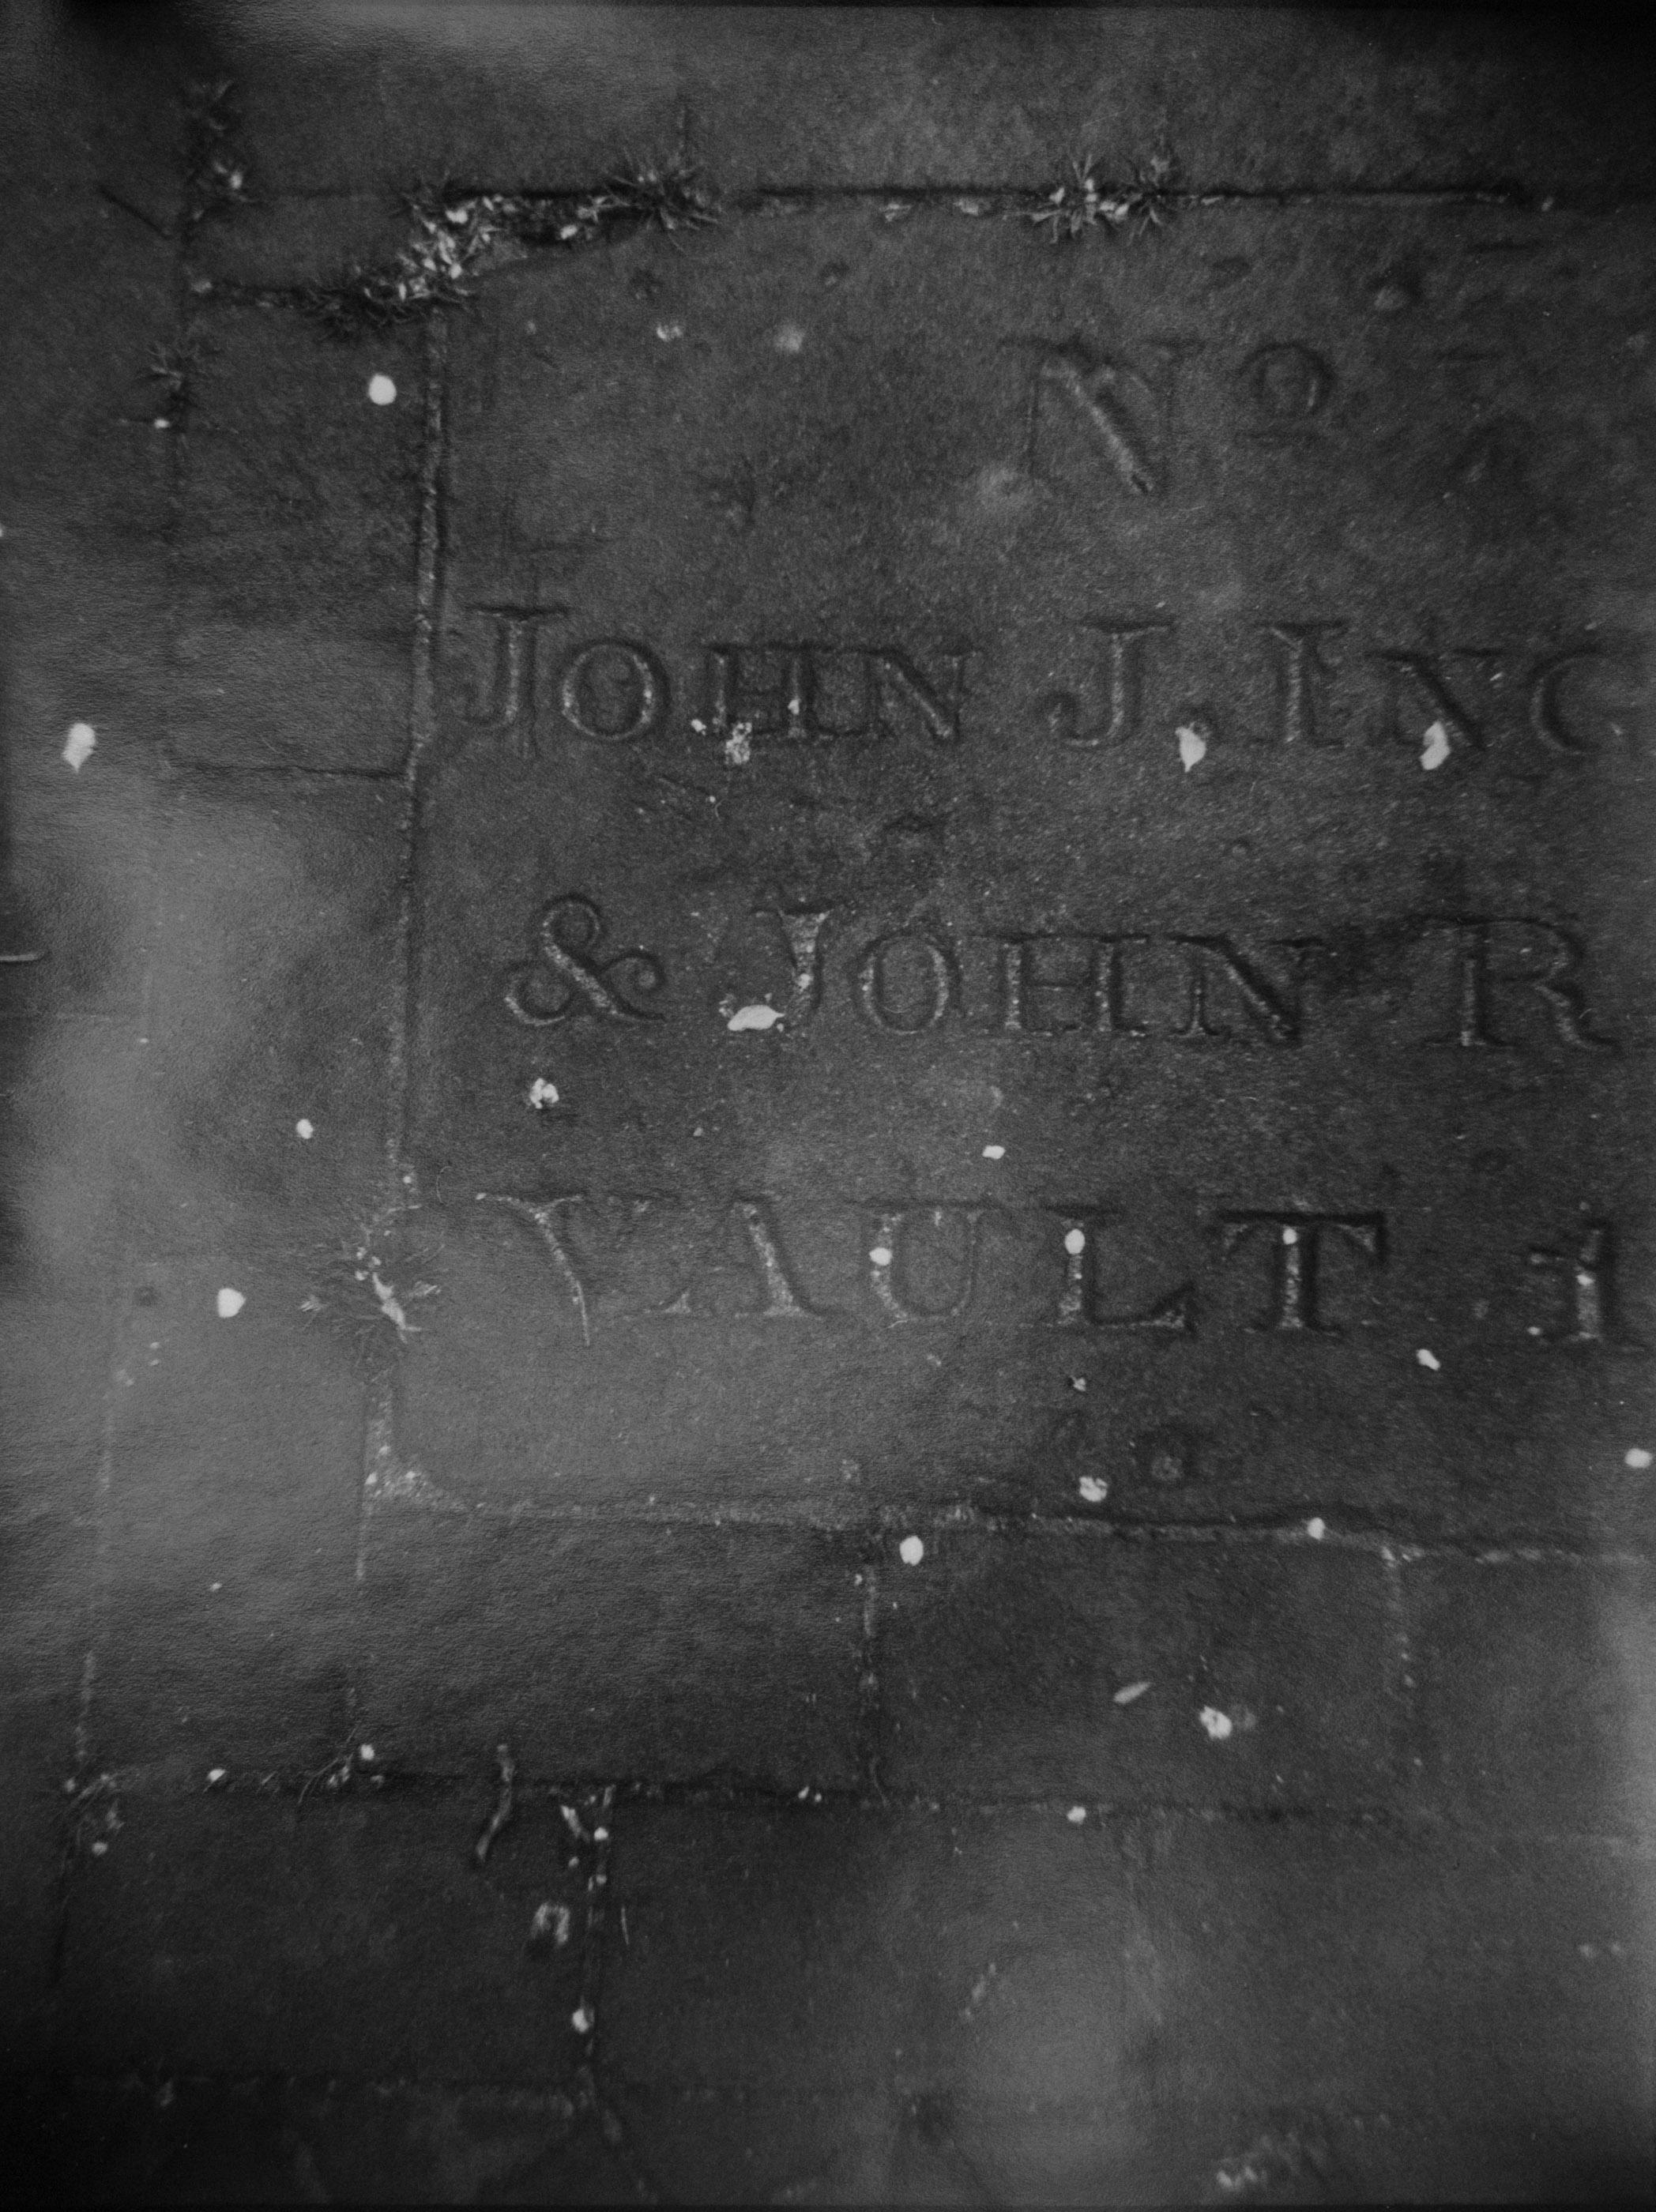 10_Grave Ground_St. Mark's Church-in-the-Bowerie, 1999-2000_.jpg